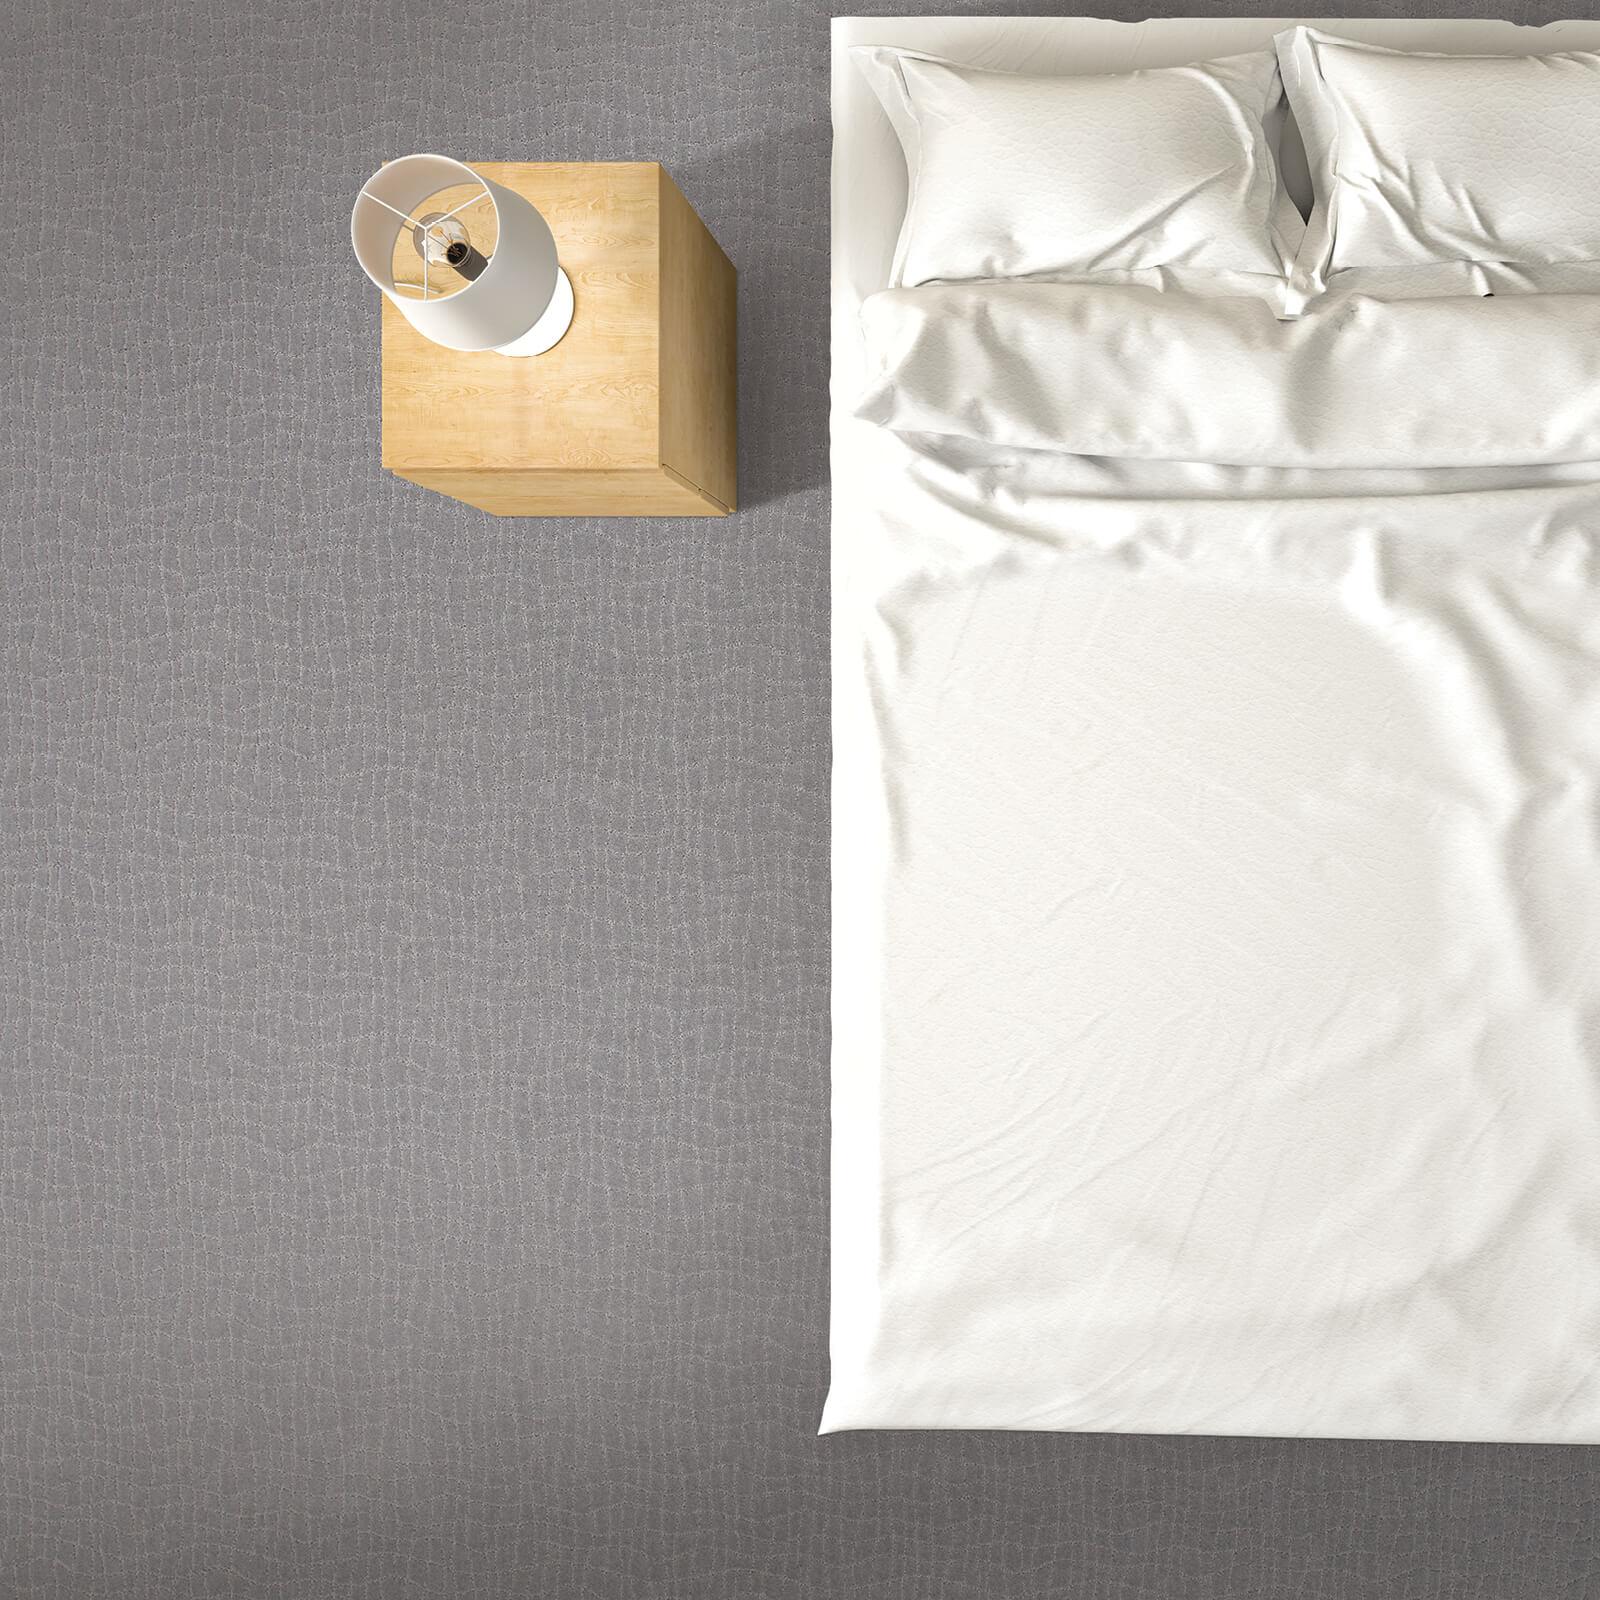 Posh appeal of bedroom | J/K Carpet Center, Inc